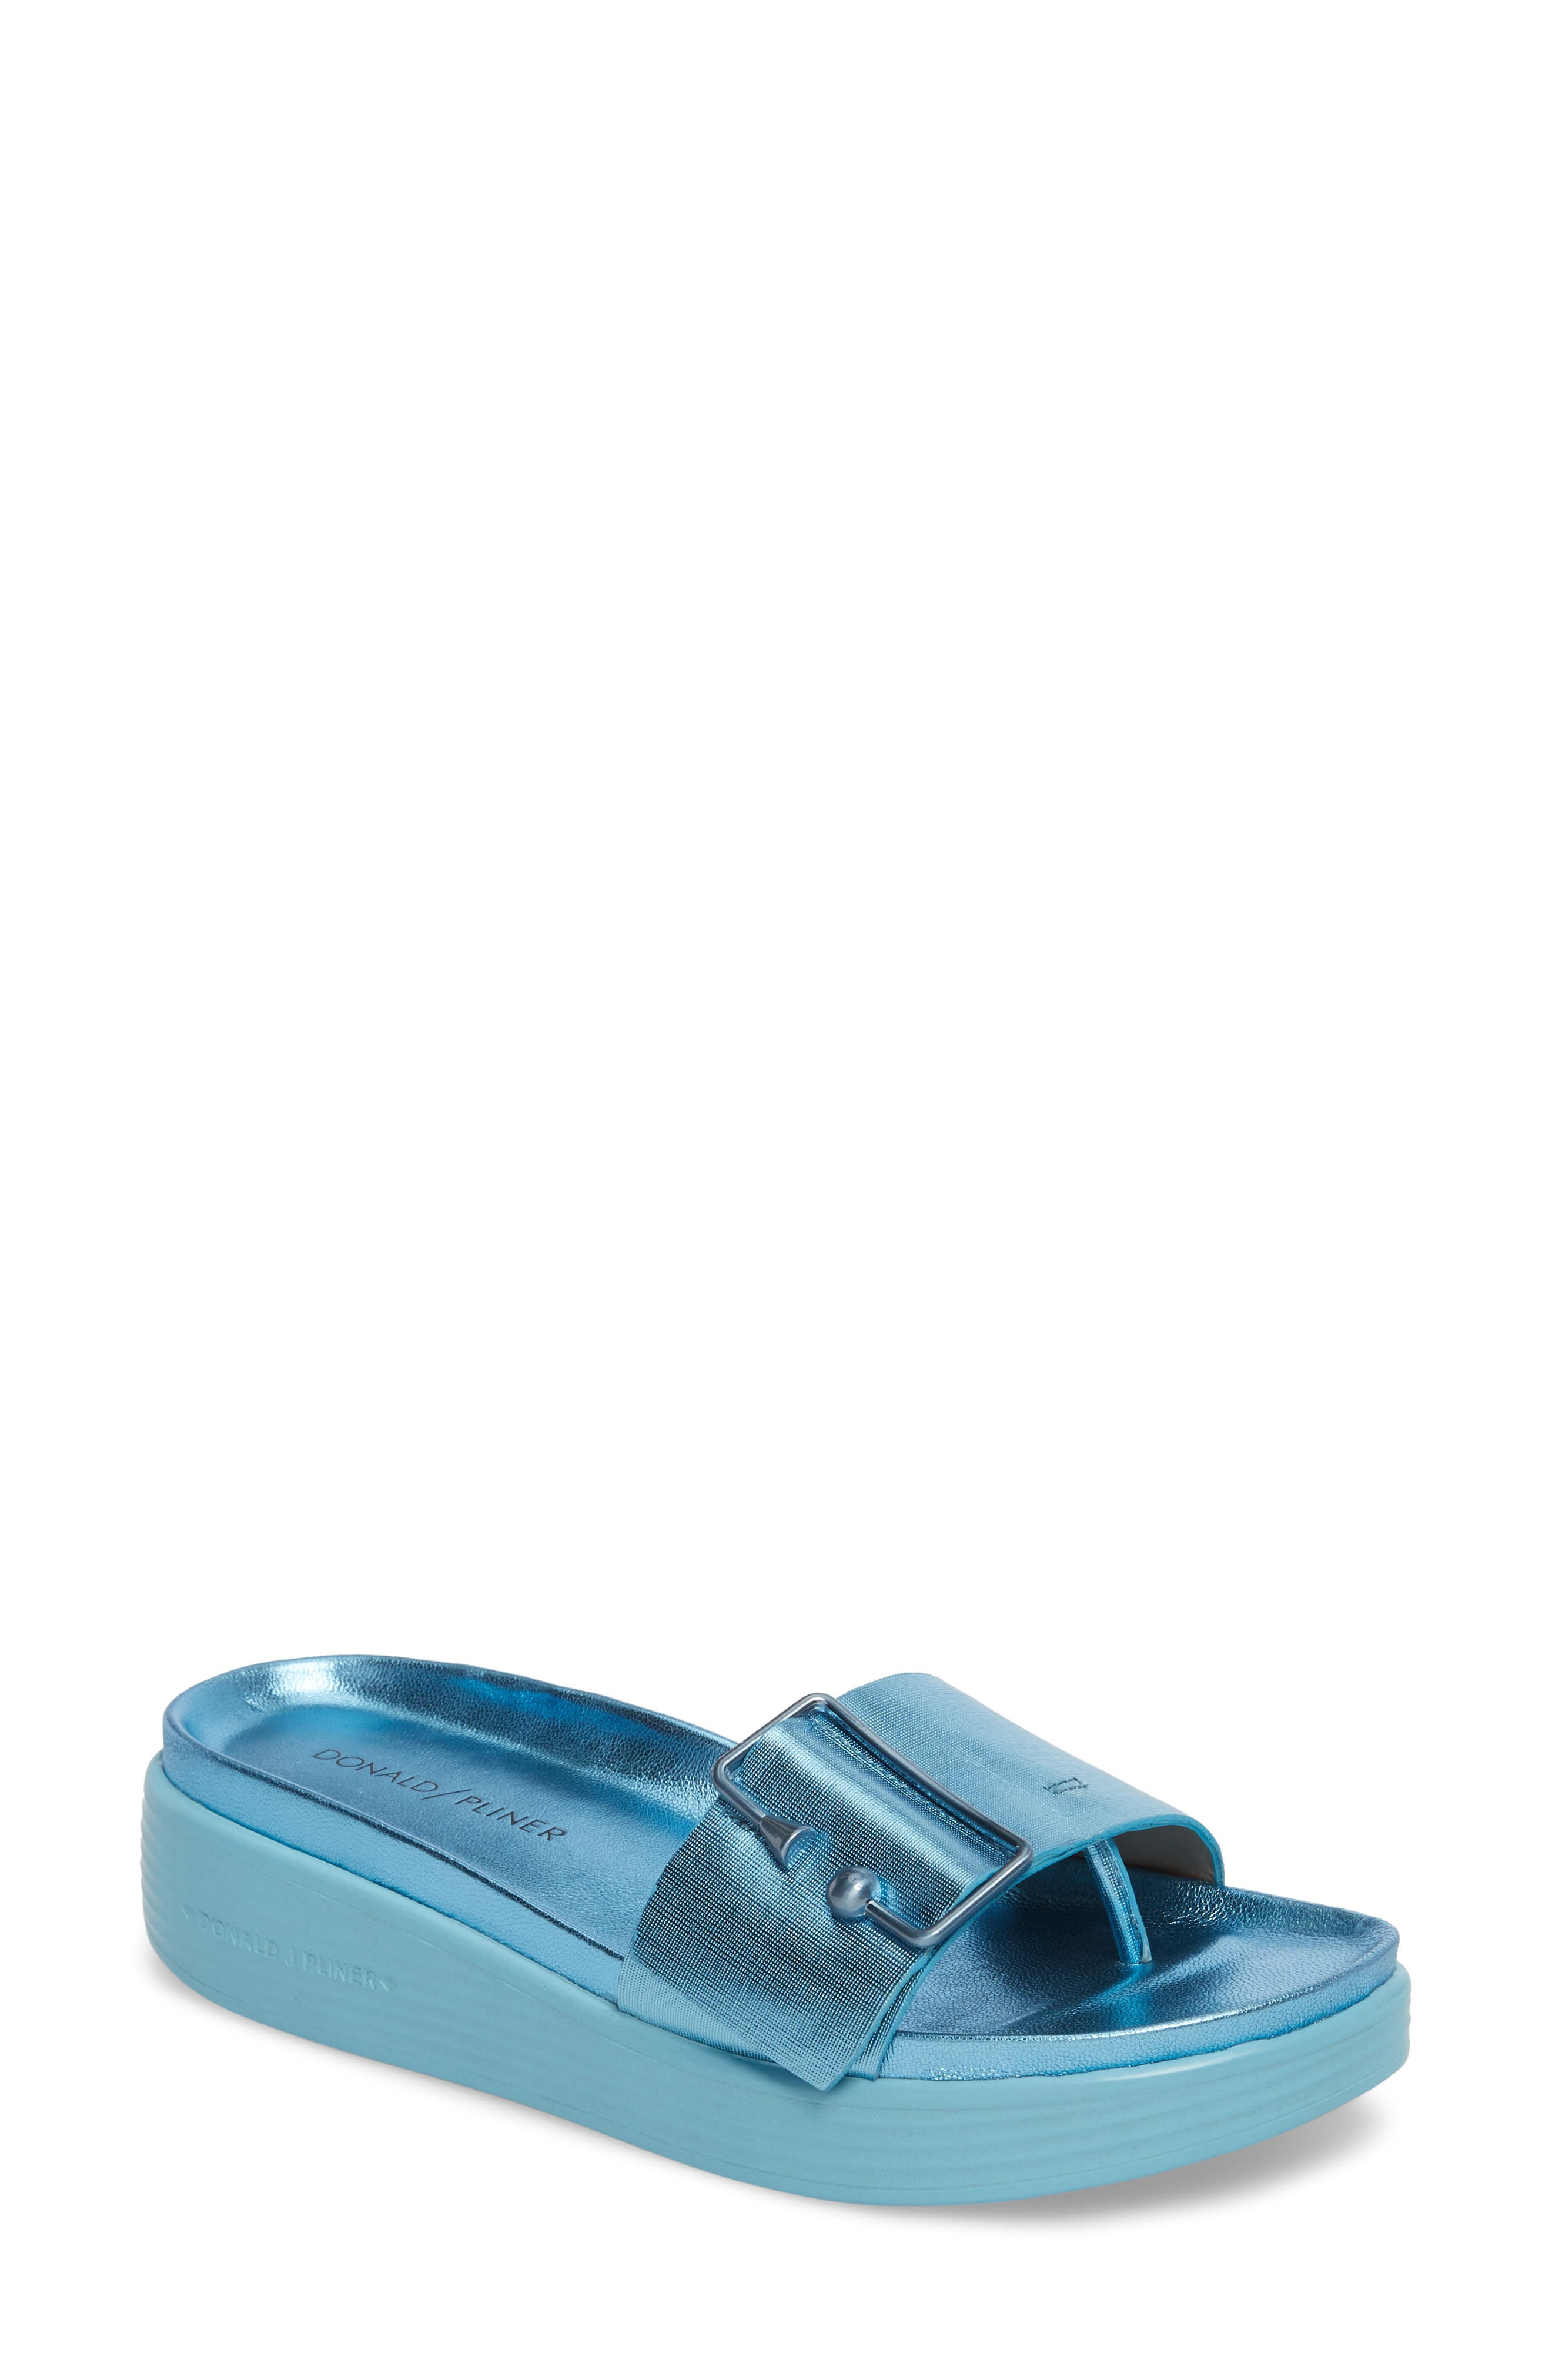 Alternate Image 1 Selected - Donald Pliner Fara Platform Slide Sandal (Women)